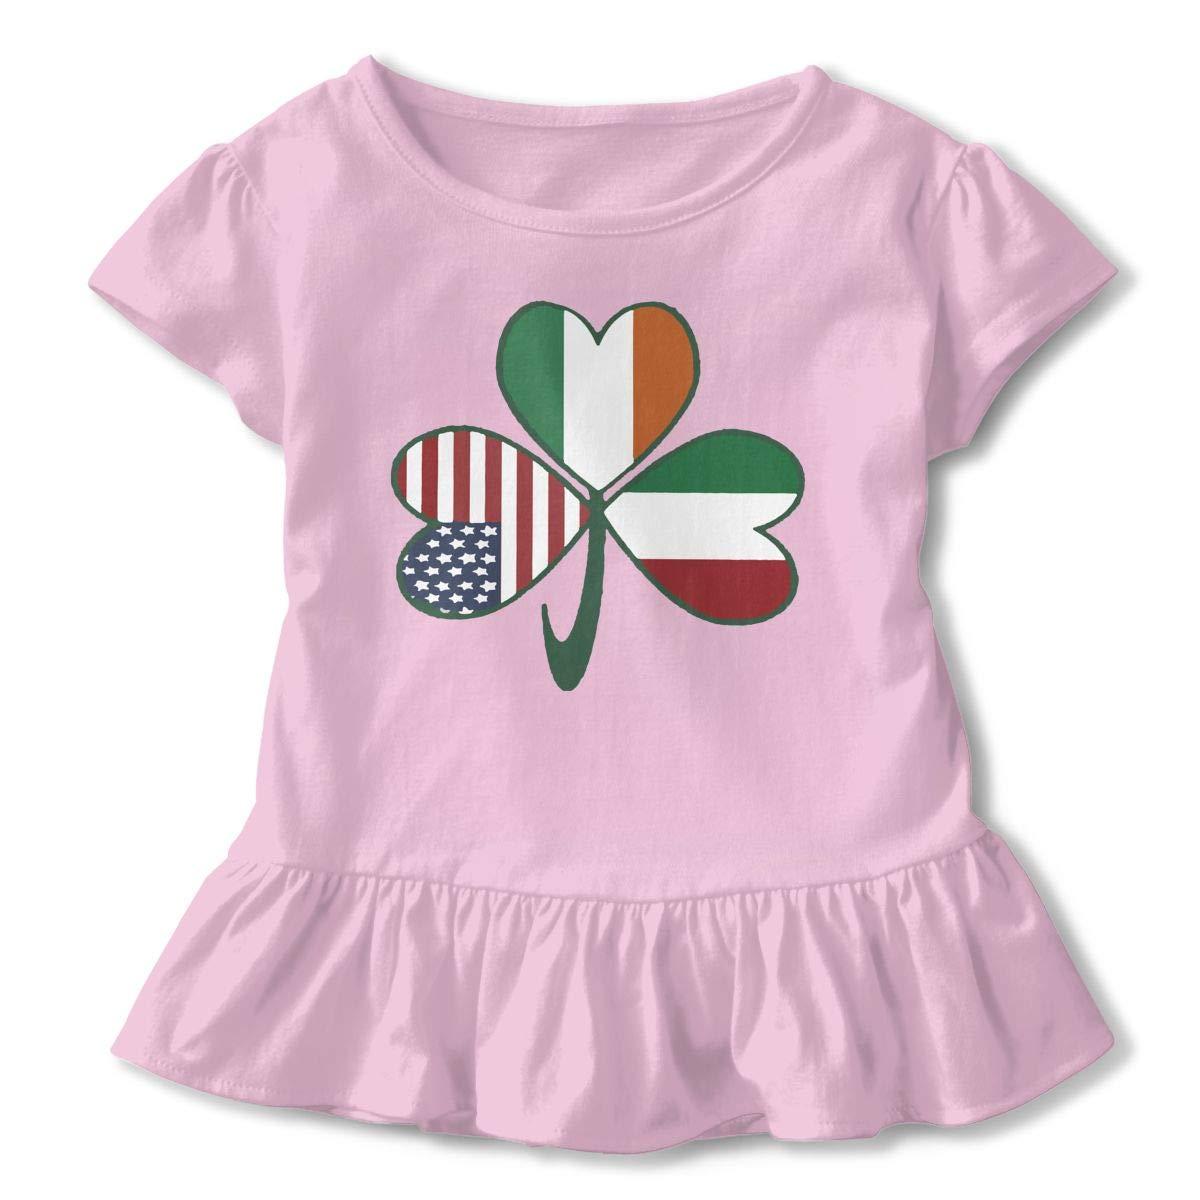 HYBDX9T Toddler Baby Girl Italian Irish American Shamrock Funny Short Sleeve Cotton T Shirts Basic Tops Tee Clothes